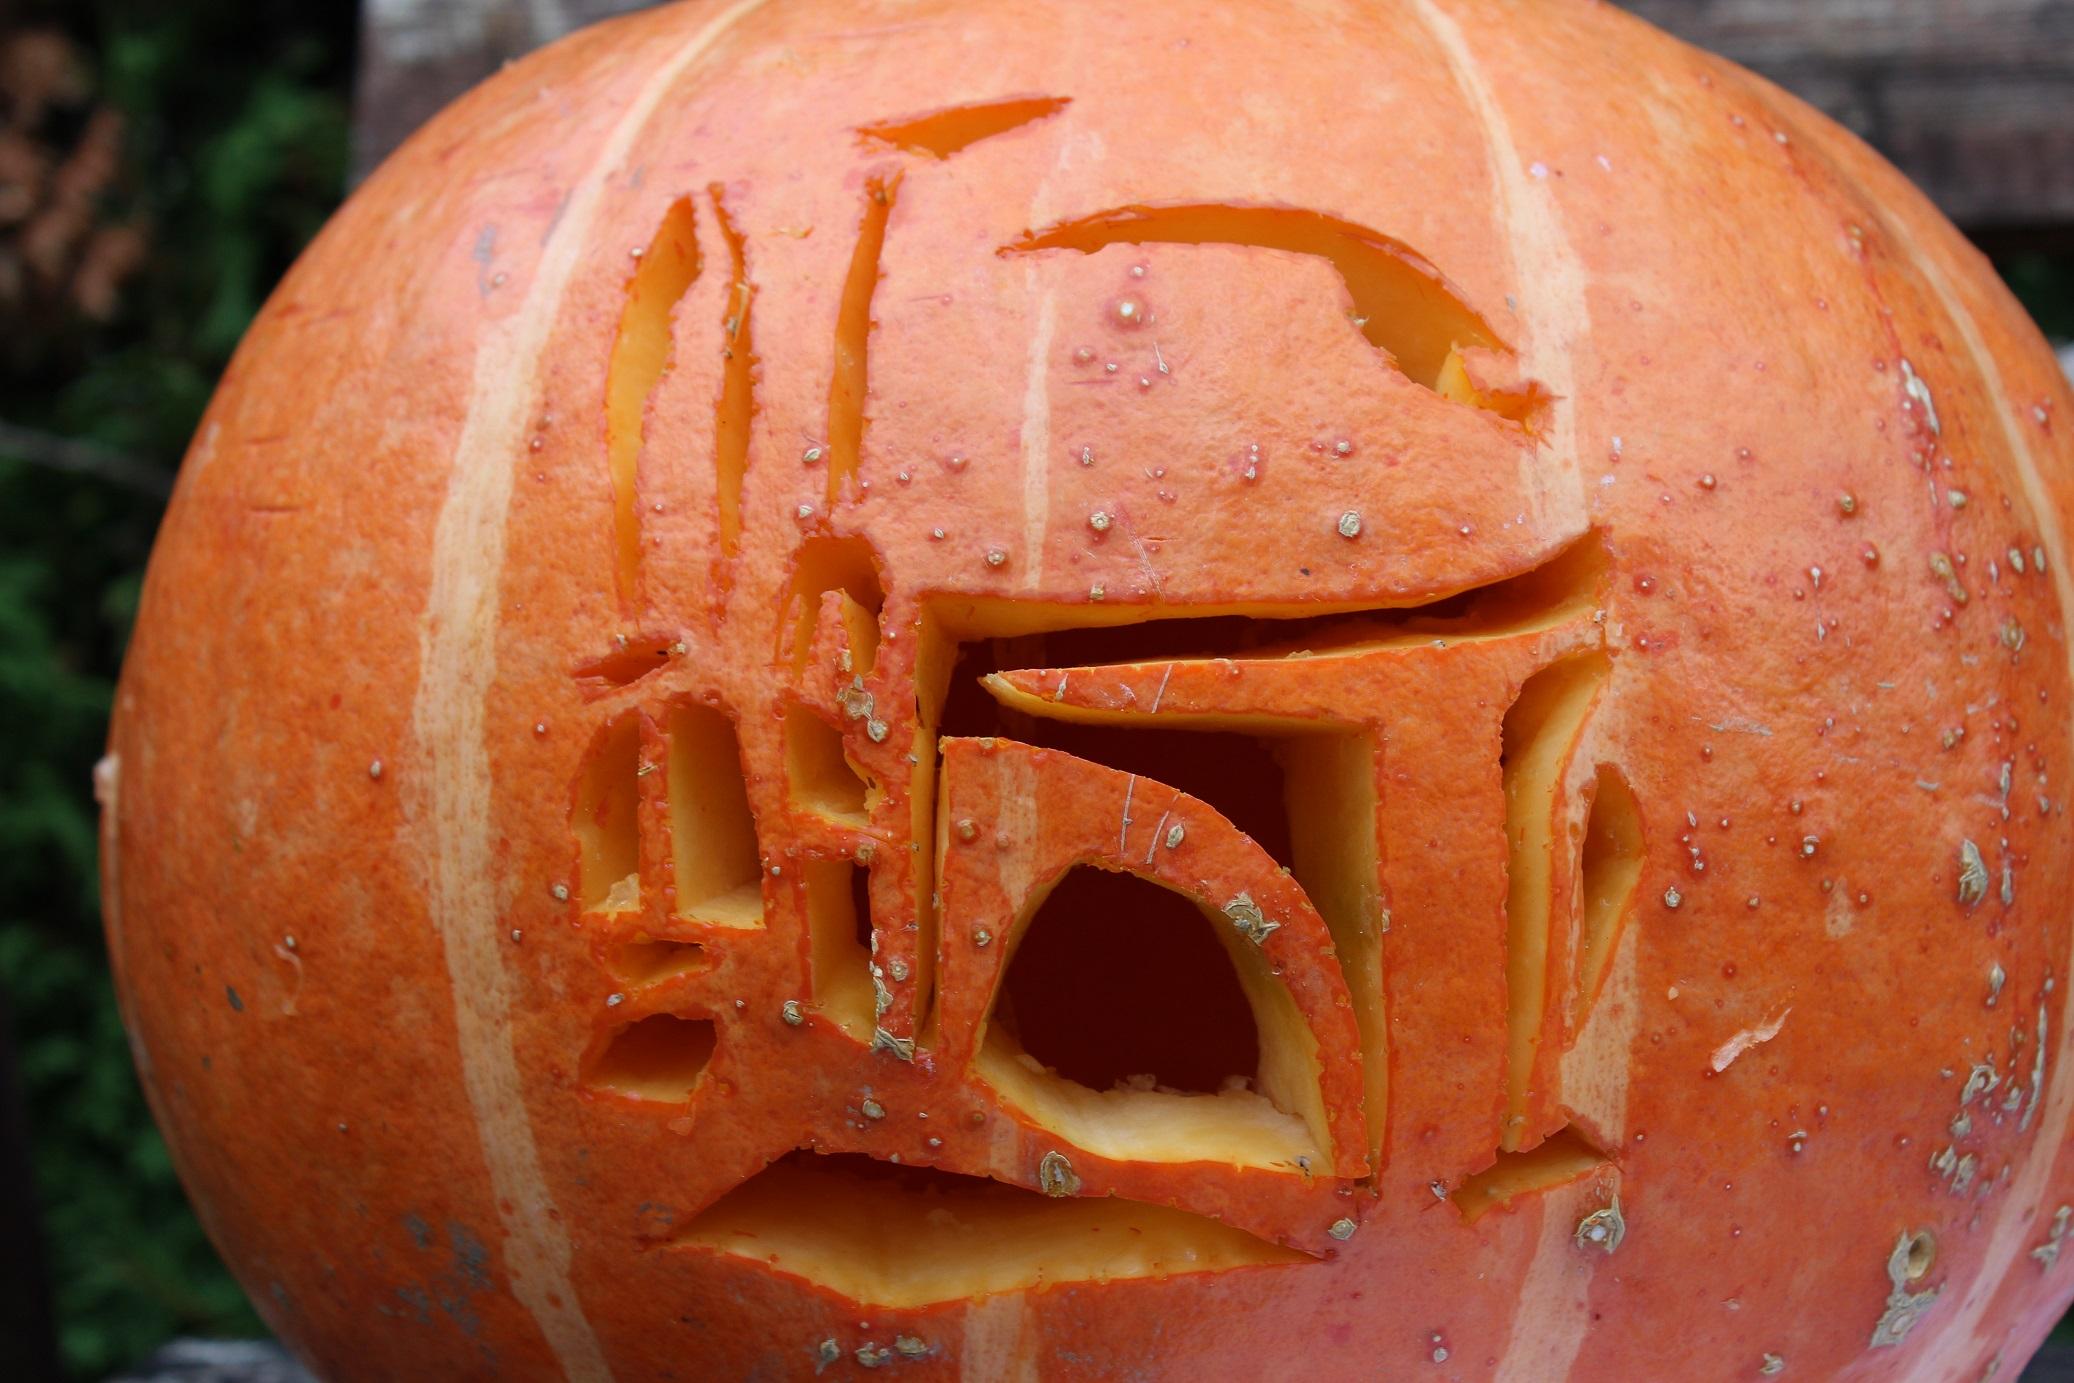 szmk_tok_pumpkin_boba_fett_star_wars_26.JPG